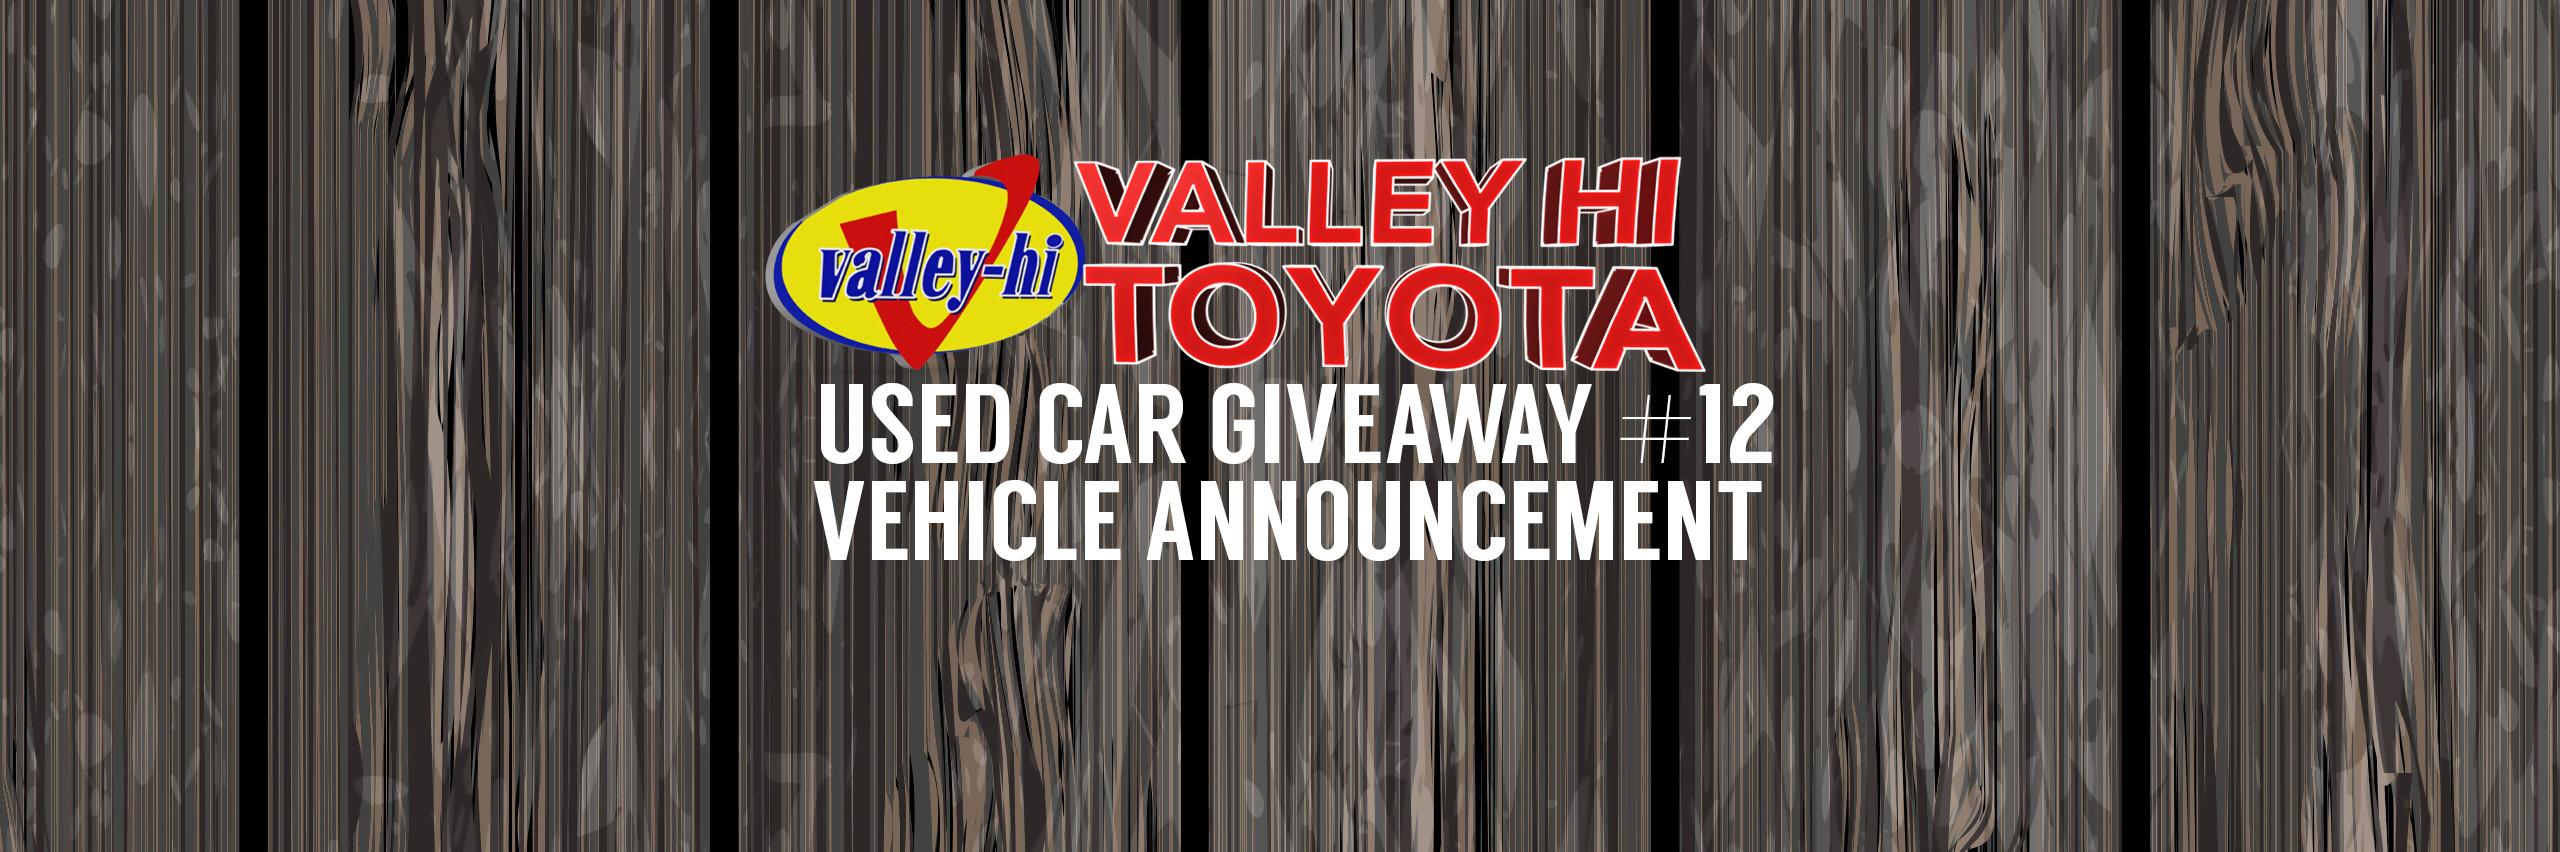 Valley Hi Toyota